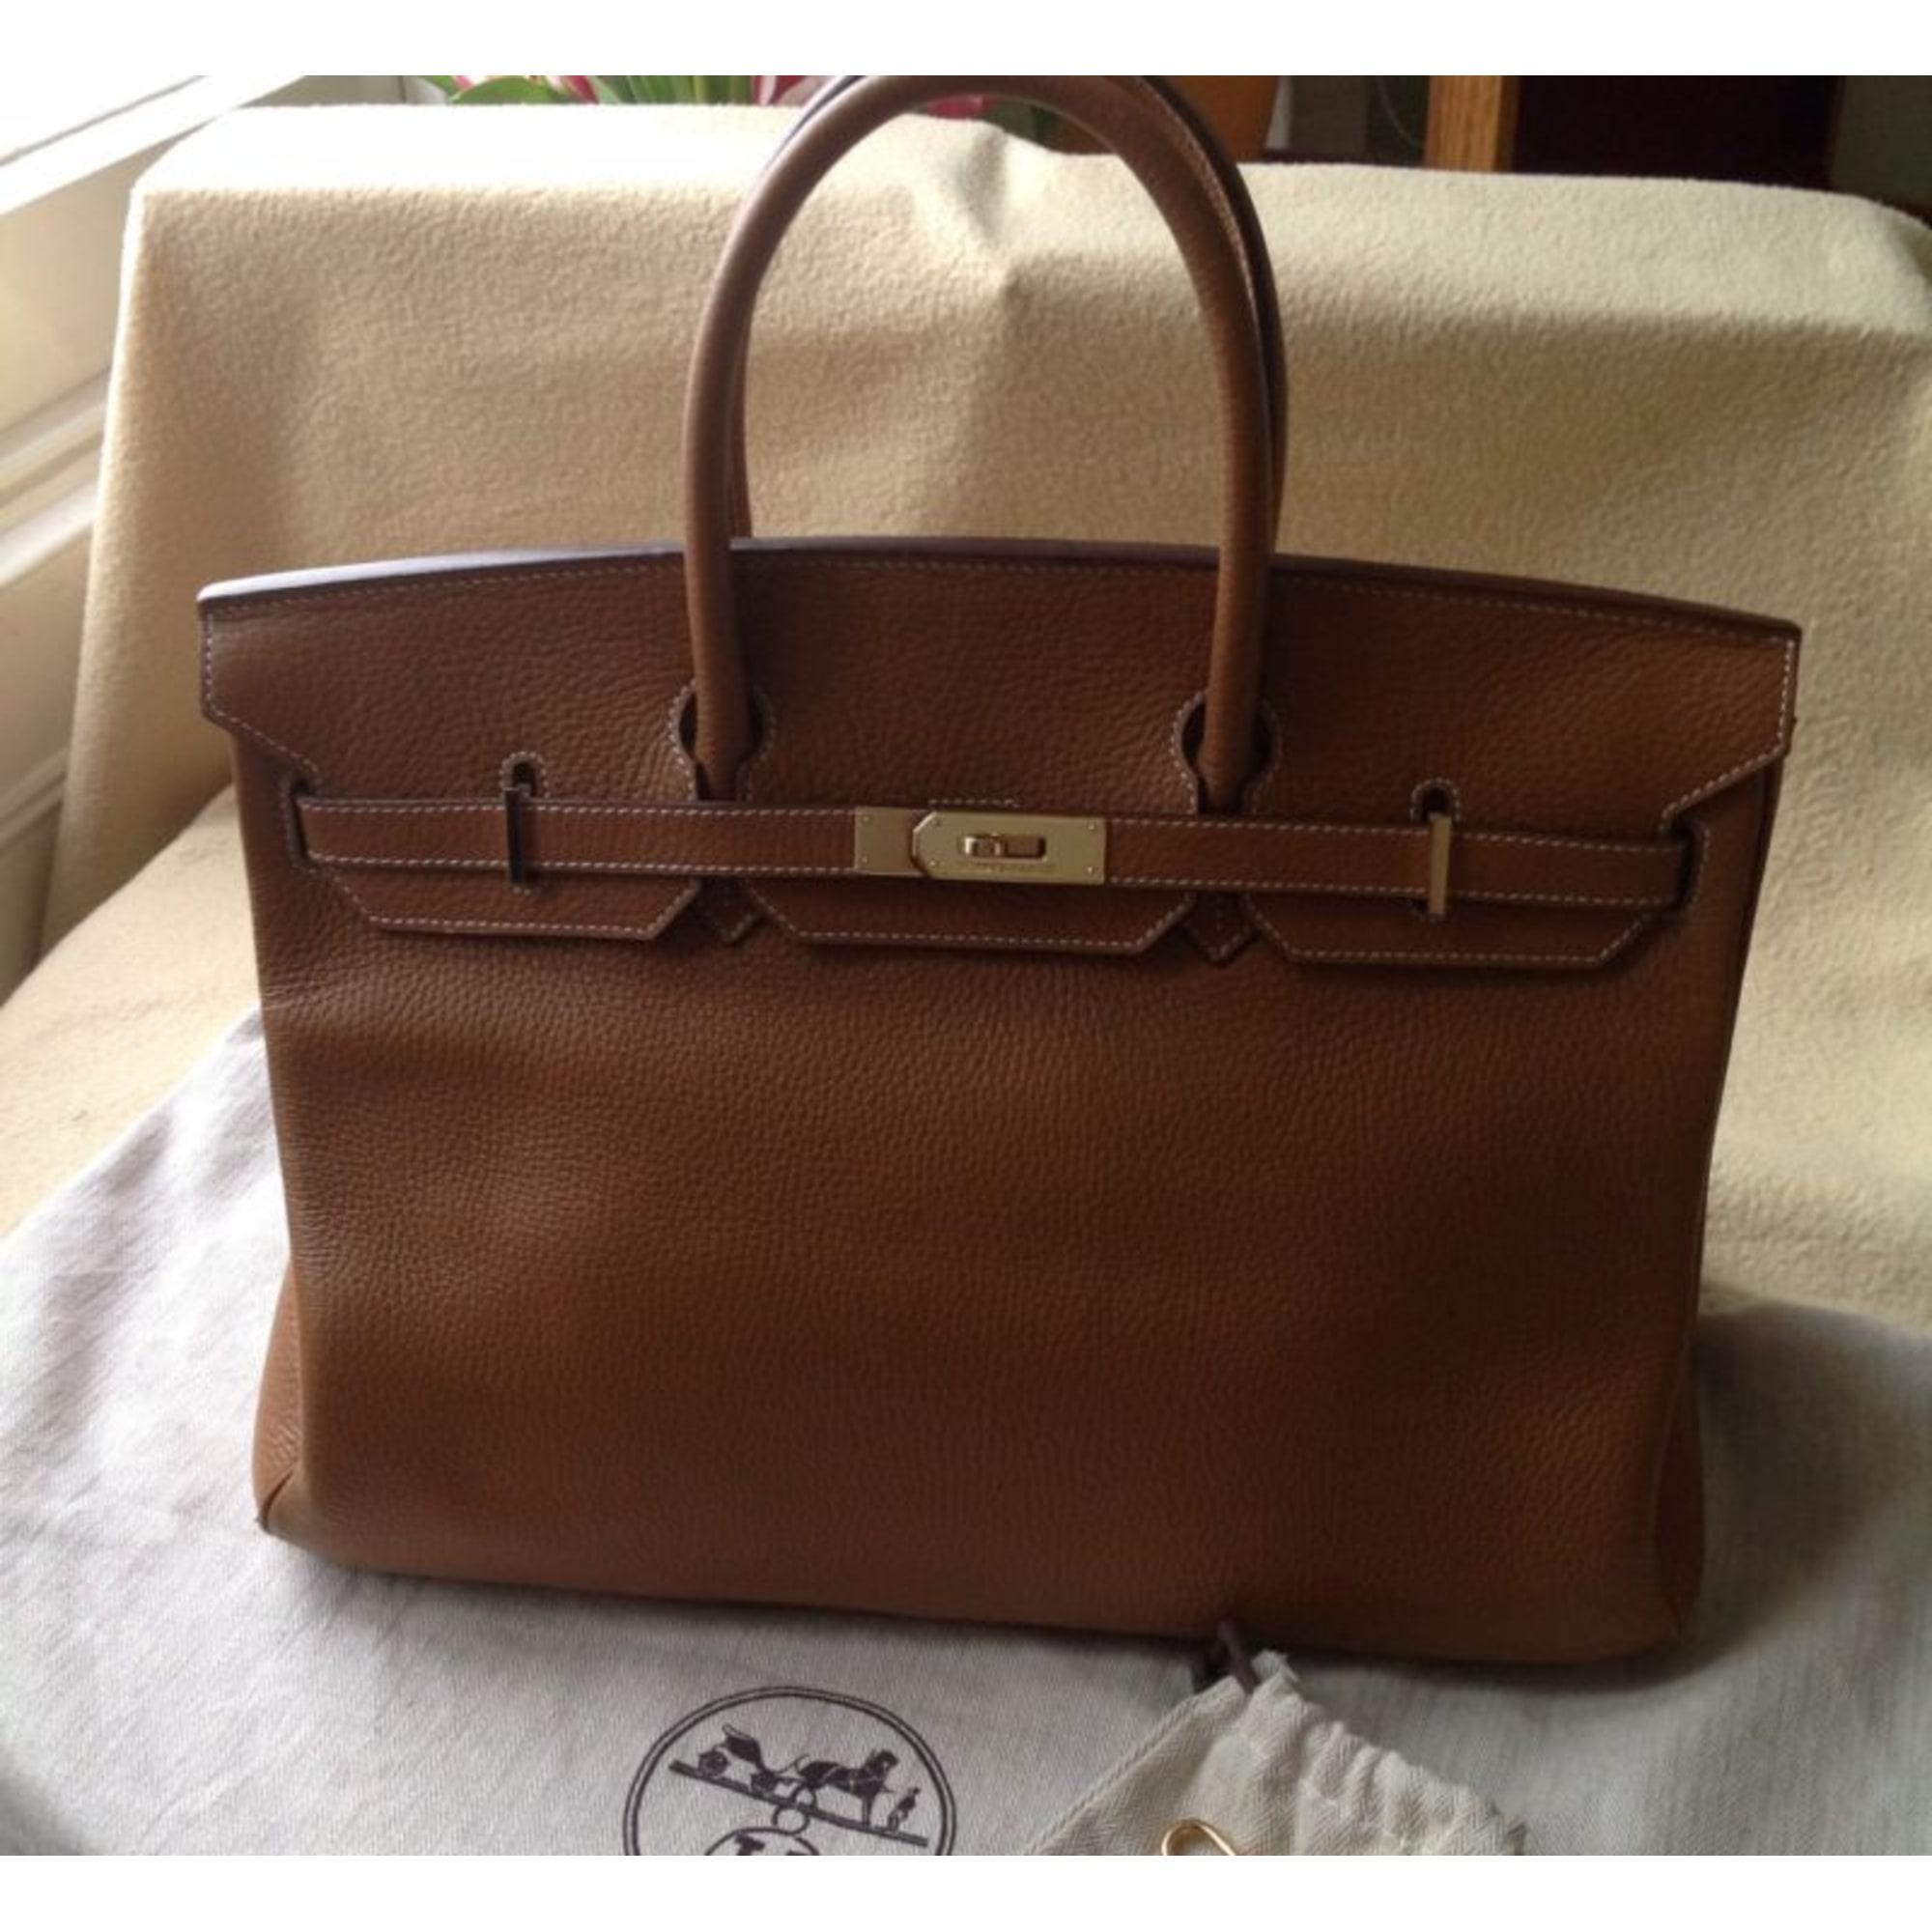 853ccb6ff0 Sac à main en cuir HERMÈS marron vendu par Folie243176 - 1123764